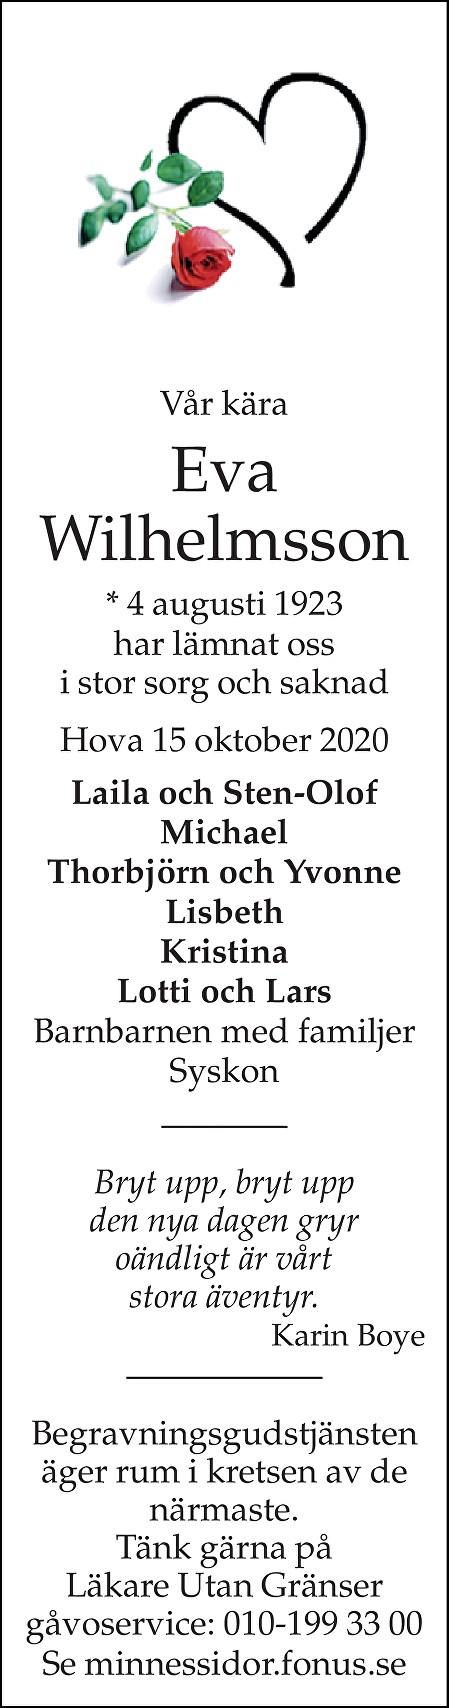 Eva Wilhelmsson Death notice